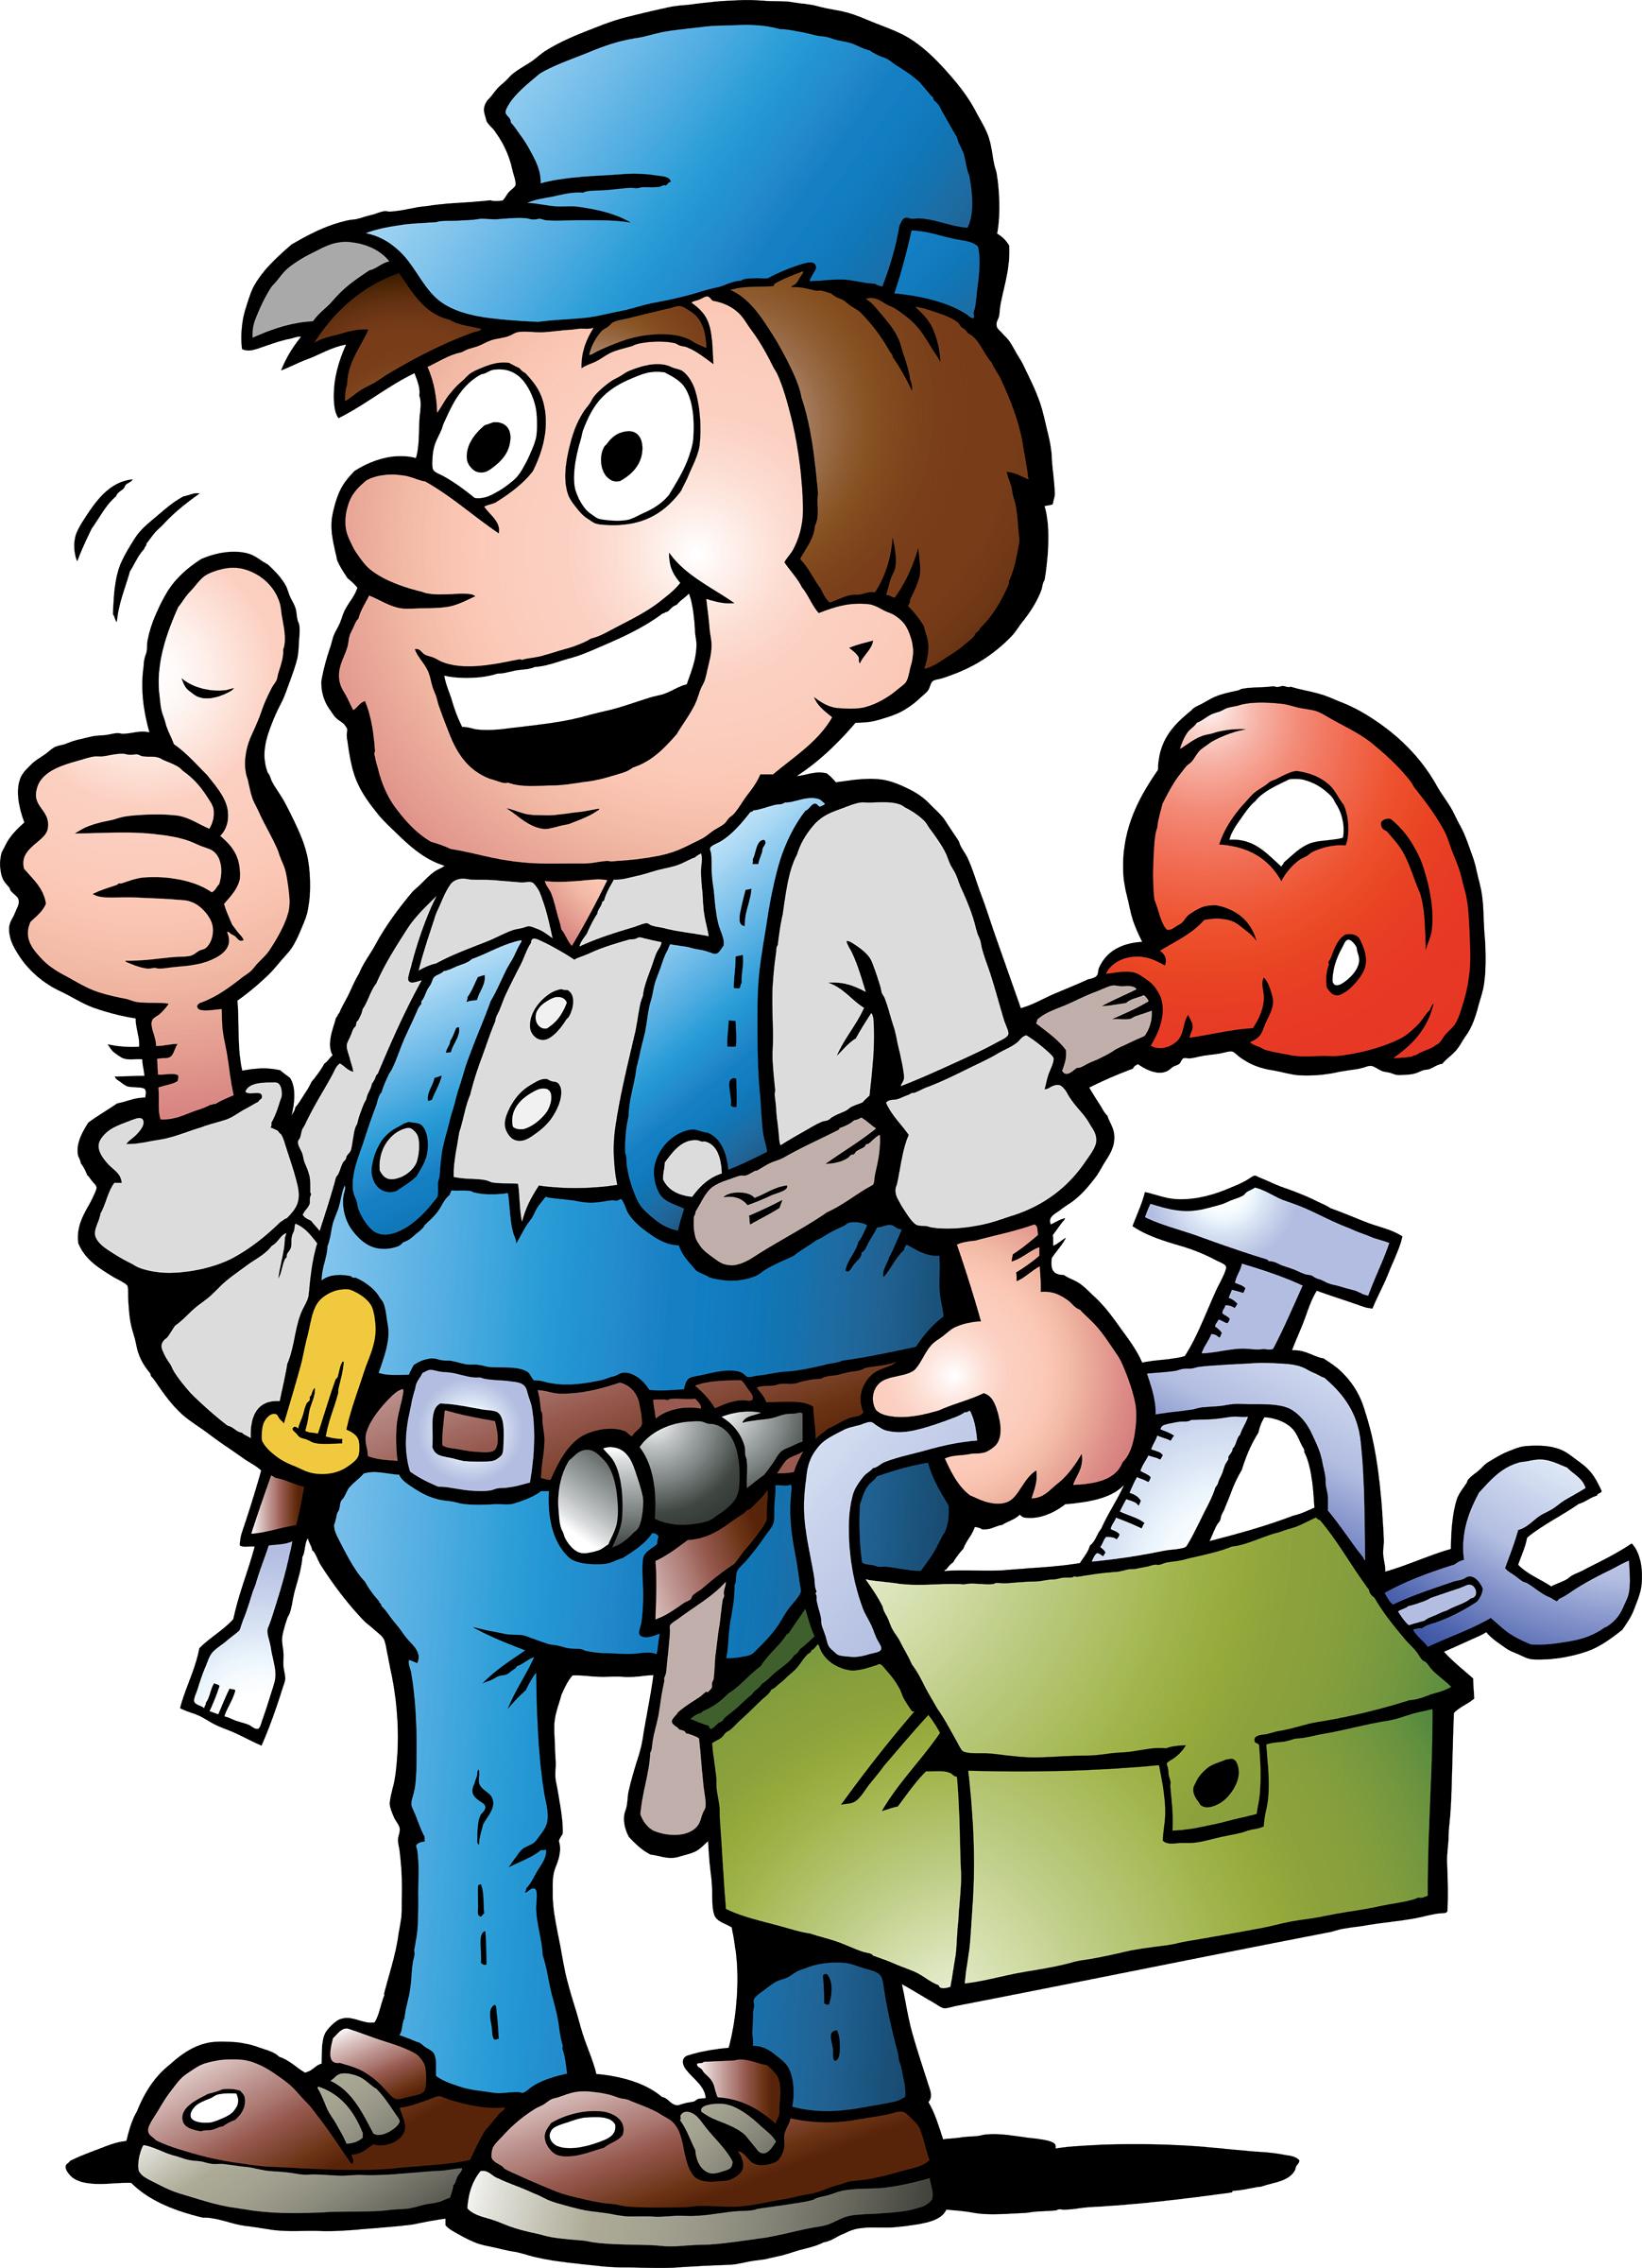 Handy man clipart banner download Free Handyman Cliparts, Download Free Clip Art, Free Clip Art on ... banner download